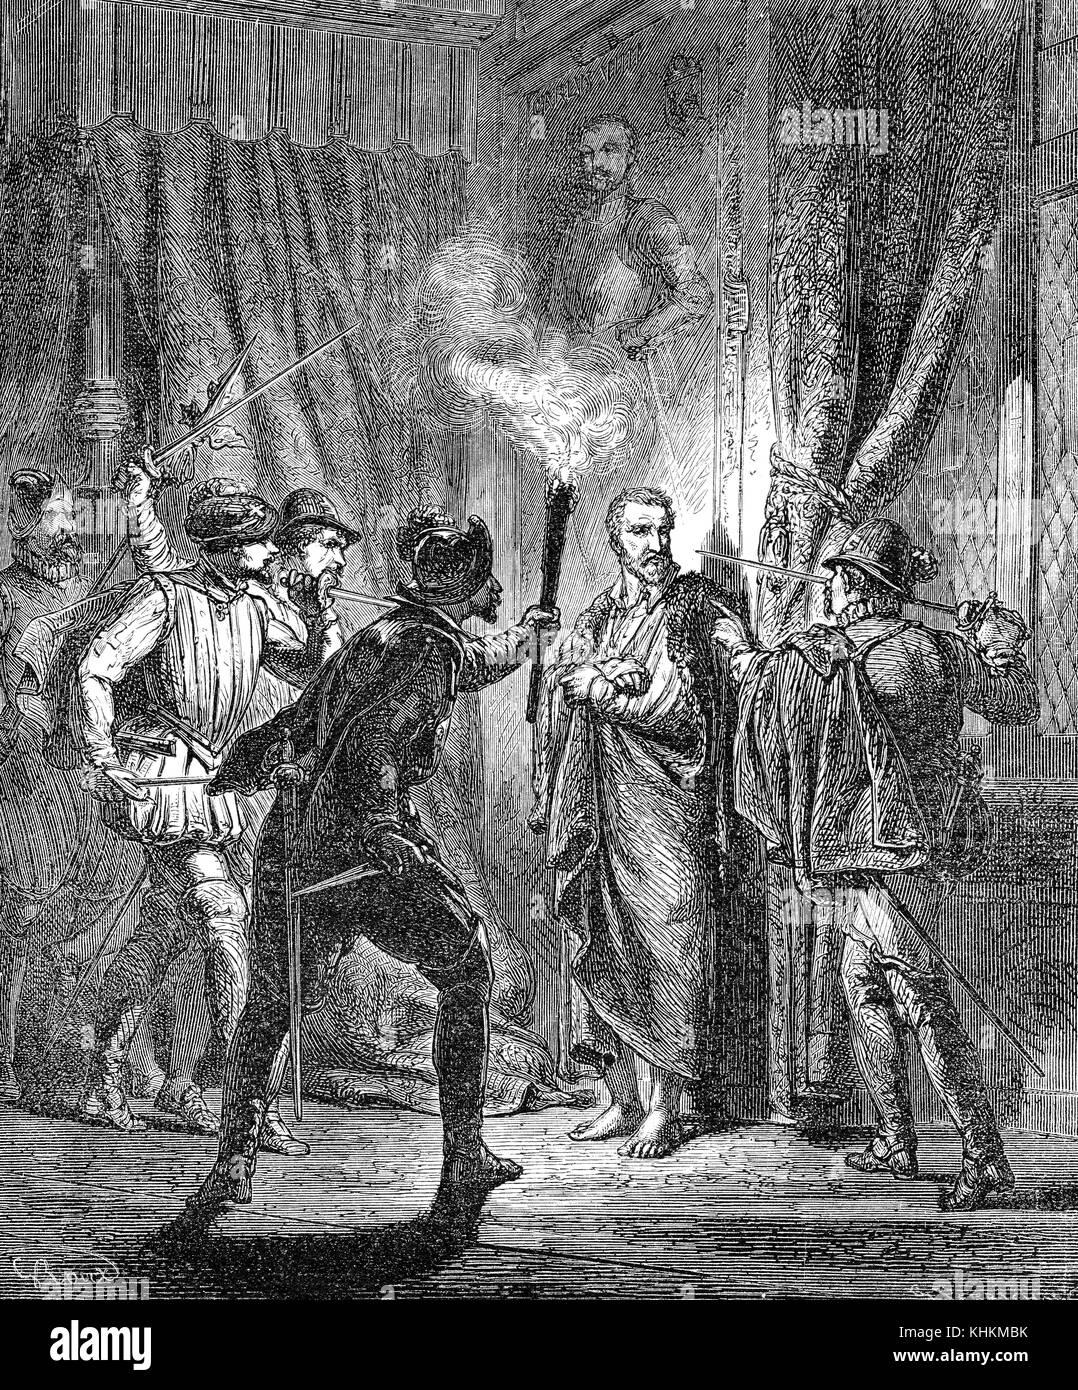 Gaspard II de Coligny, Comte de Coligny, impressing his murderers, The Massacre of St. Bartholomew's Eve Stock Photo